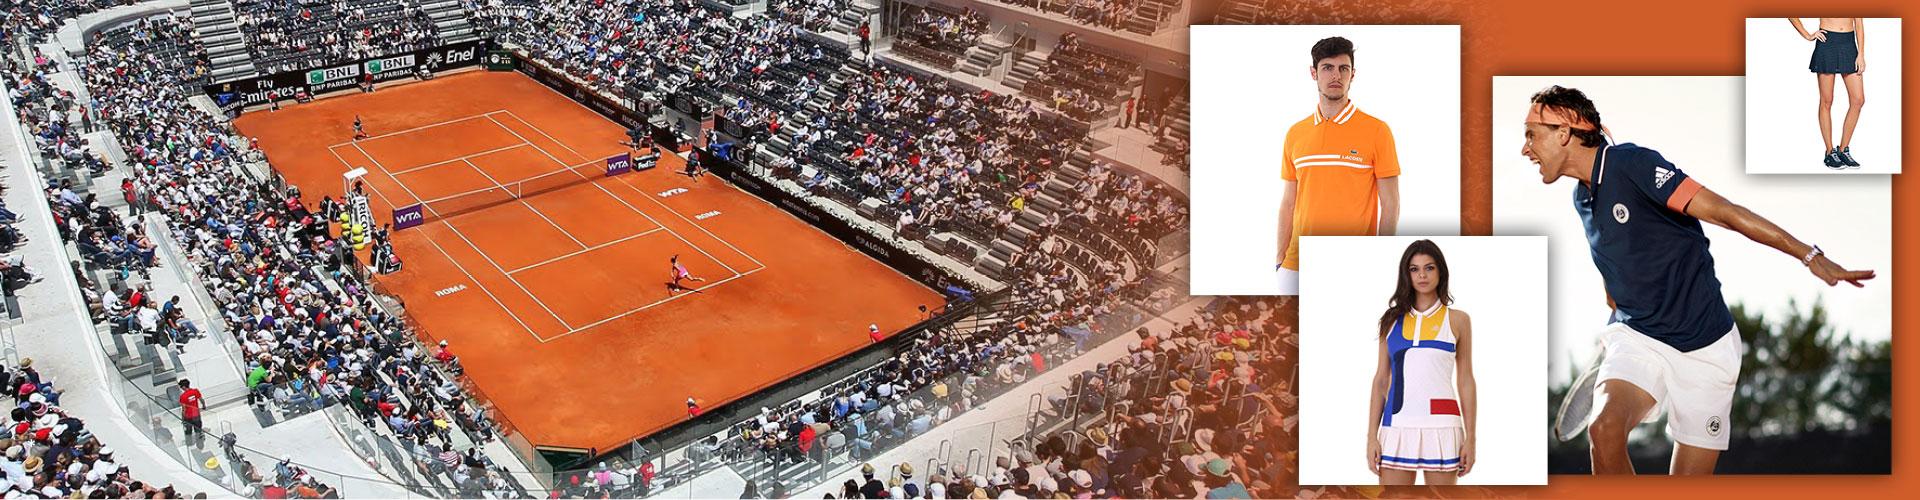 Promo Tennis Sconto 30% Abbigliamento e Calzature